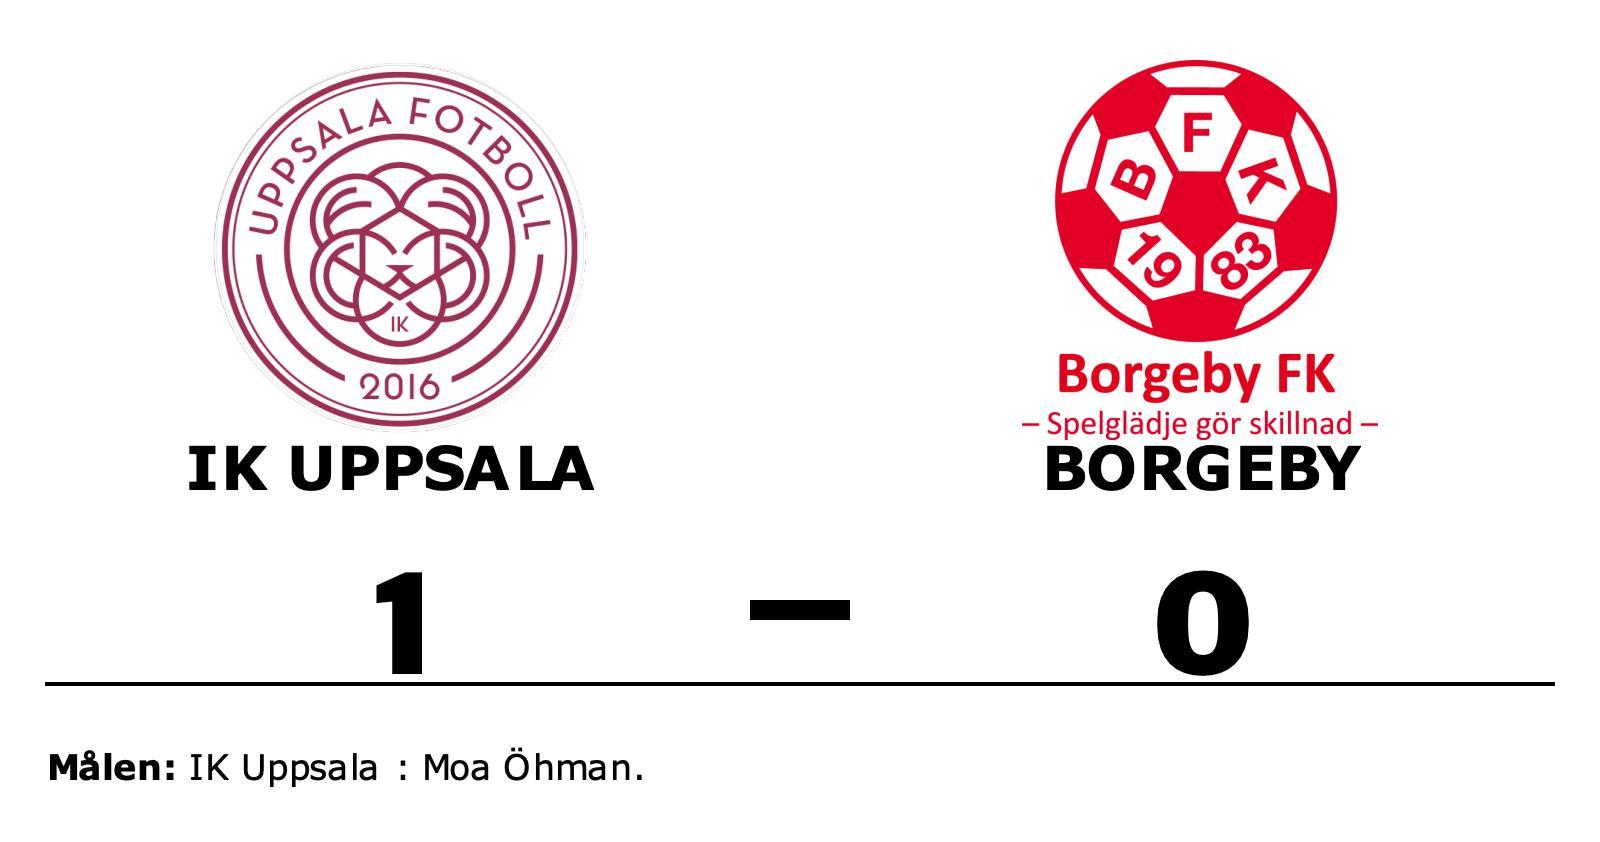 Moa Öhman matchhjälte för IK Uppsala hemma mot Borgeby